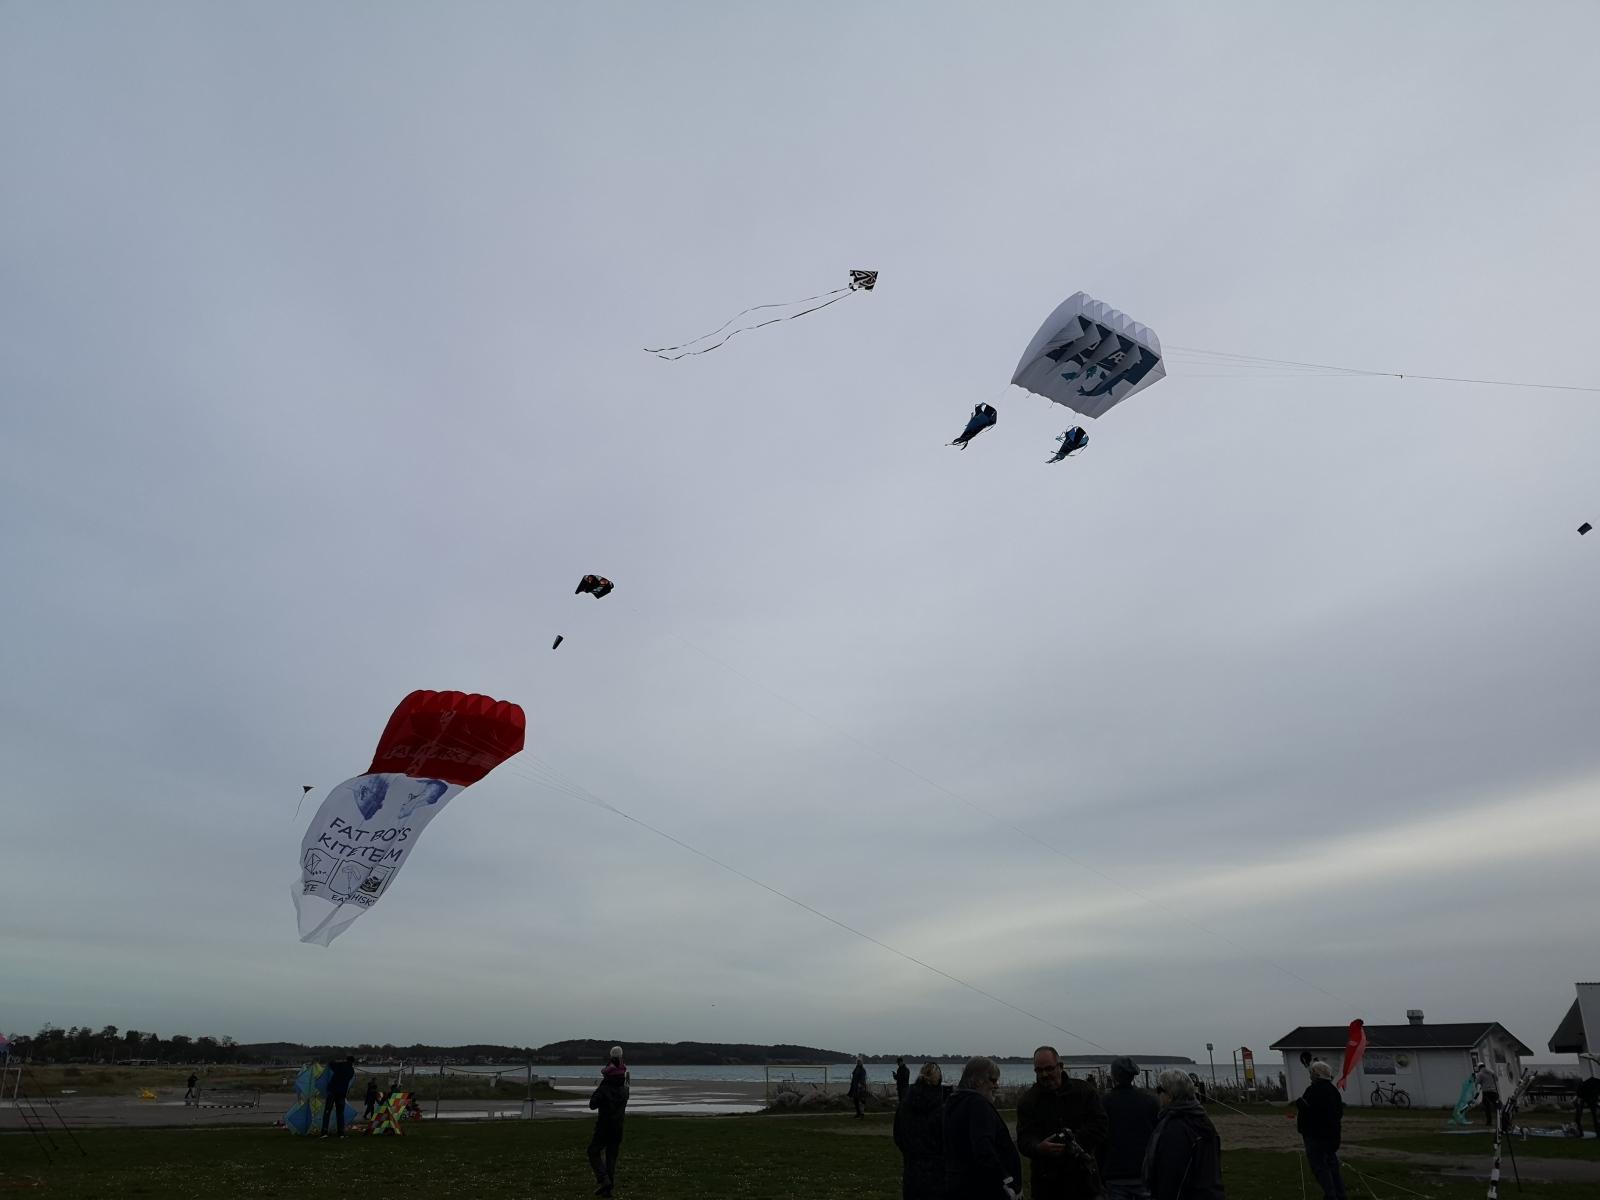 Pilot kites